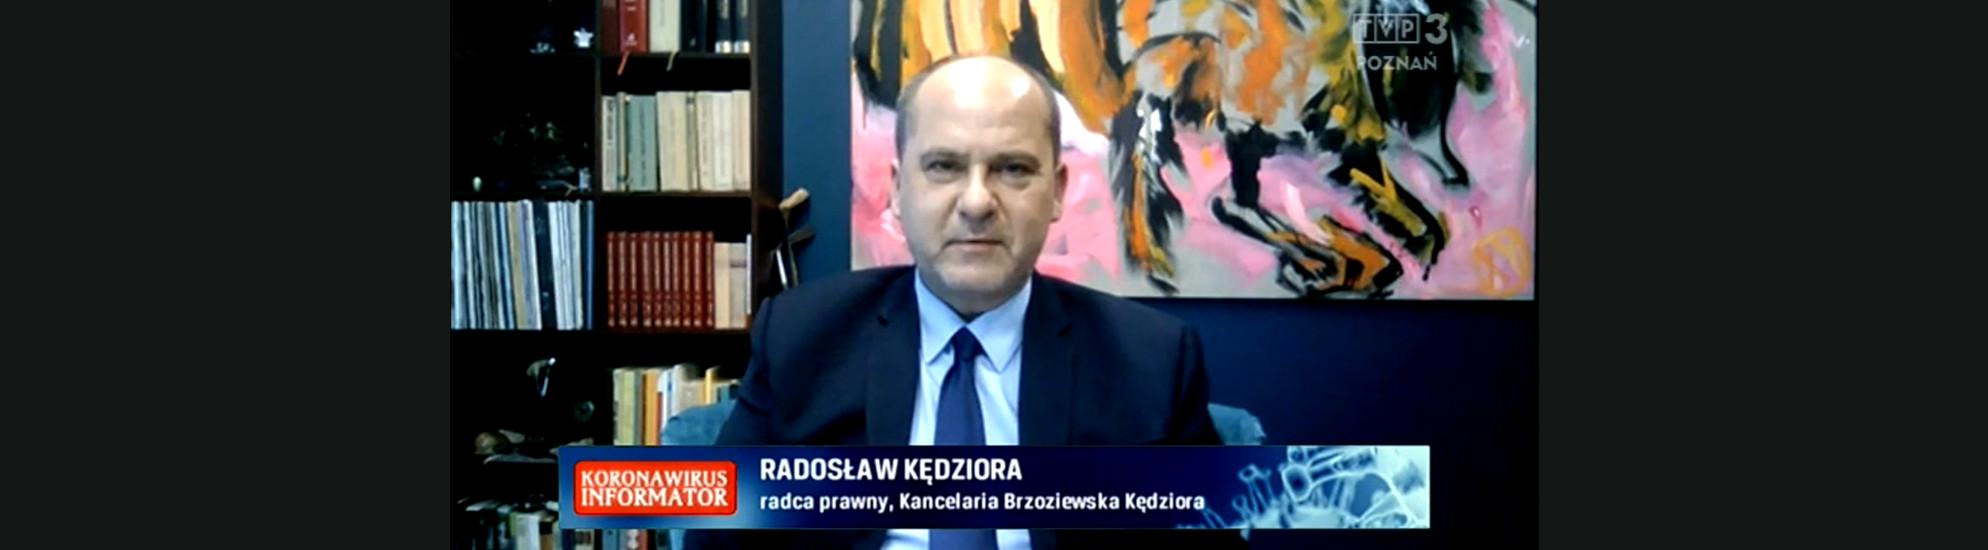 "Porady prawne dla programu TVP3 ""Koronawirus – Informator"""